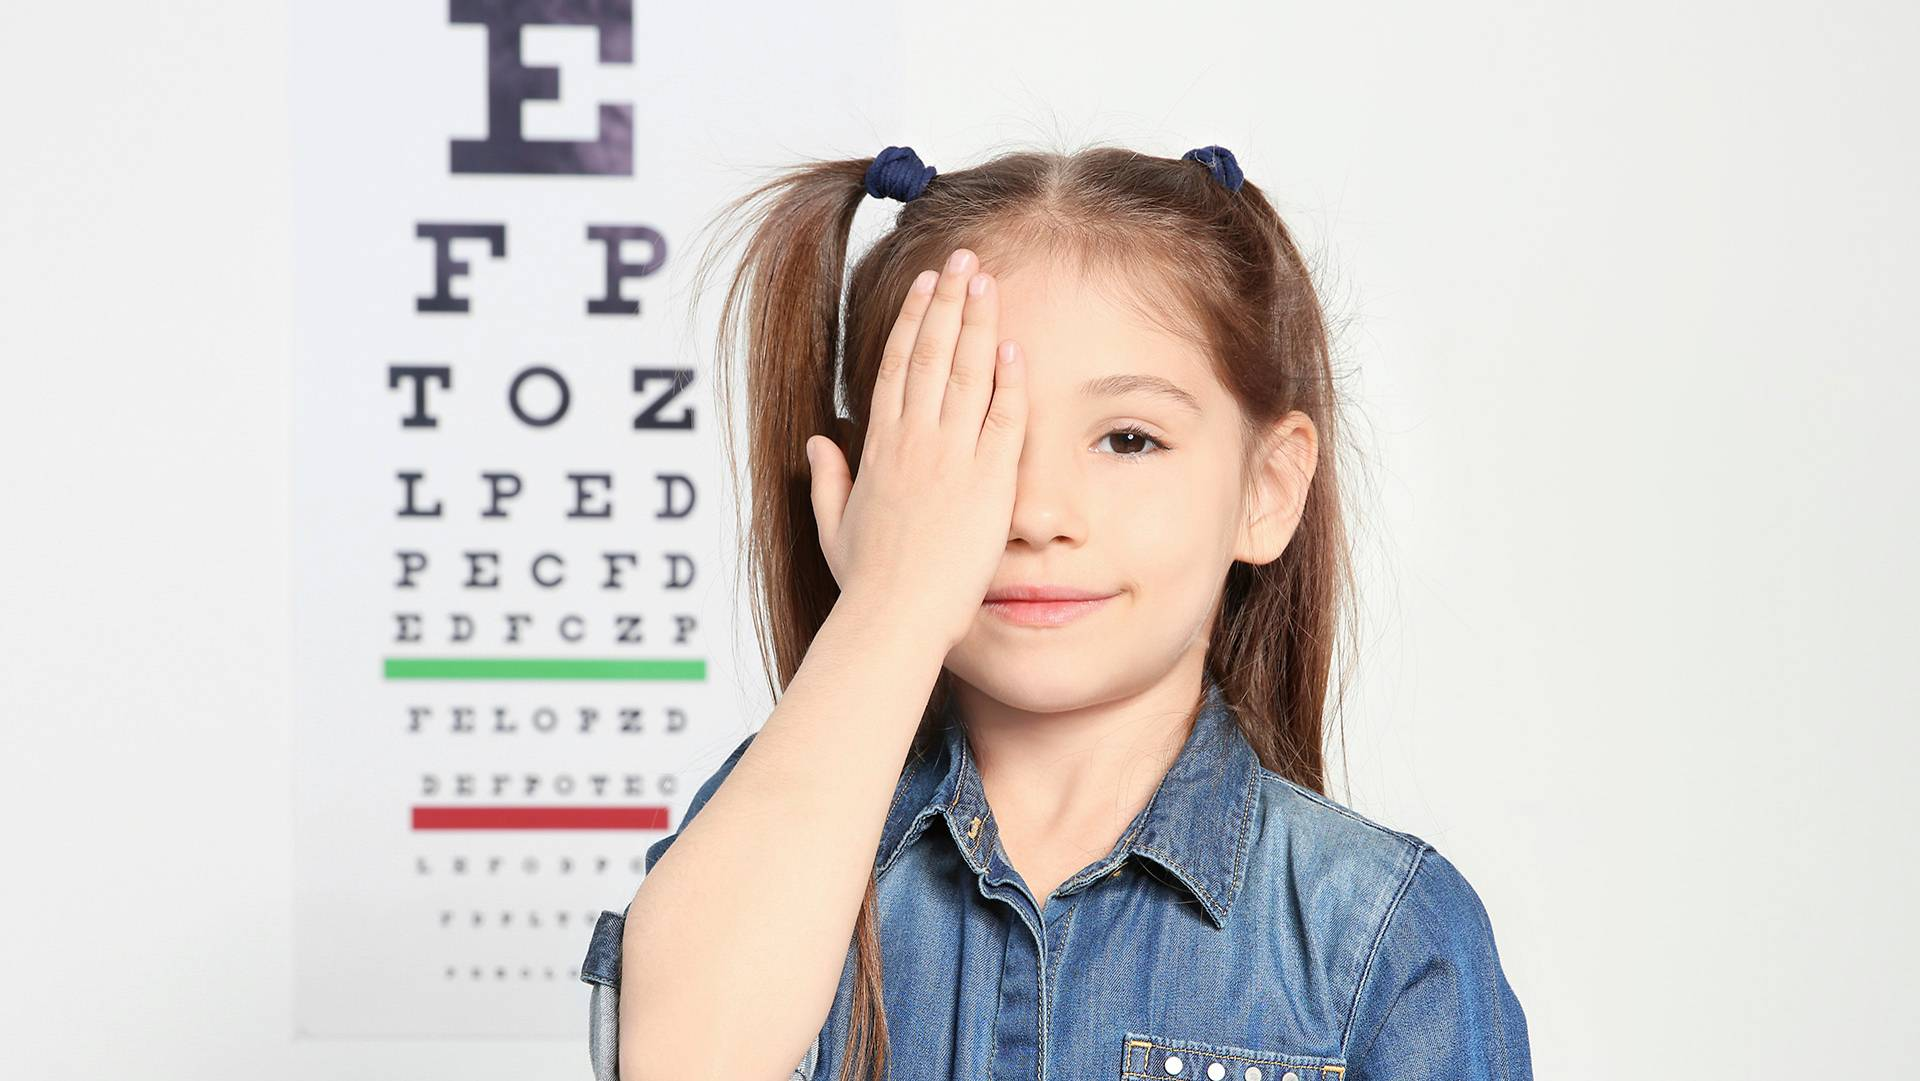 myopia-children-contact-lens-atropine-eye-chart-blur.jpg